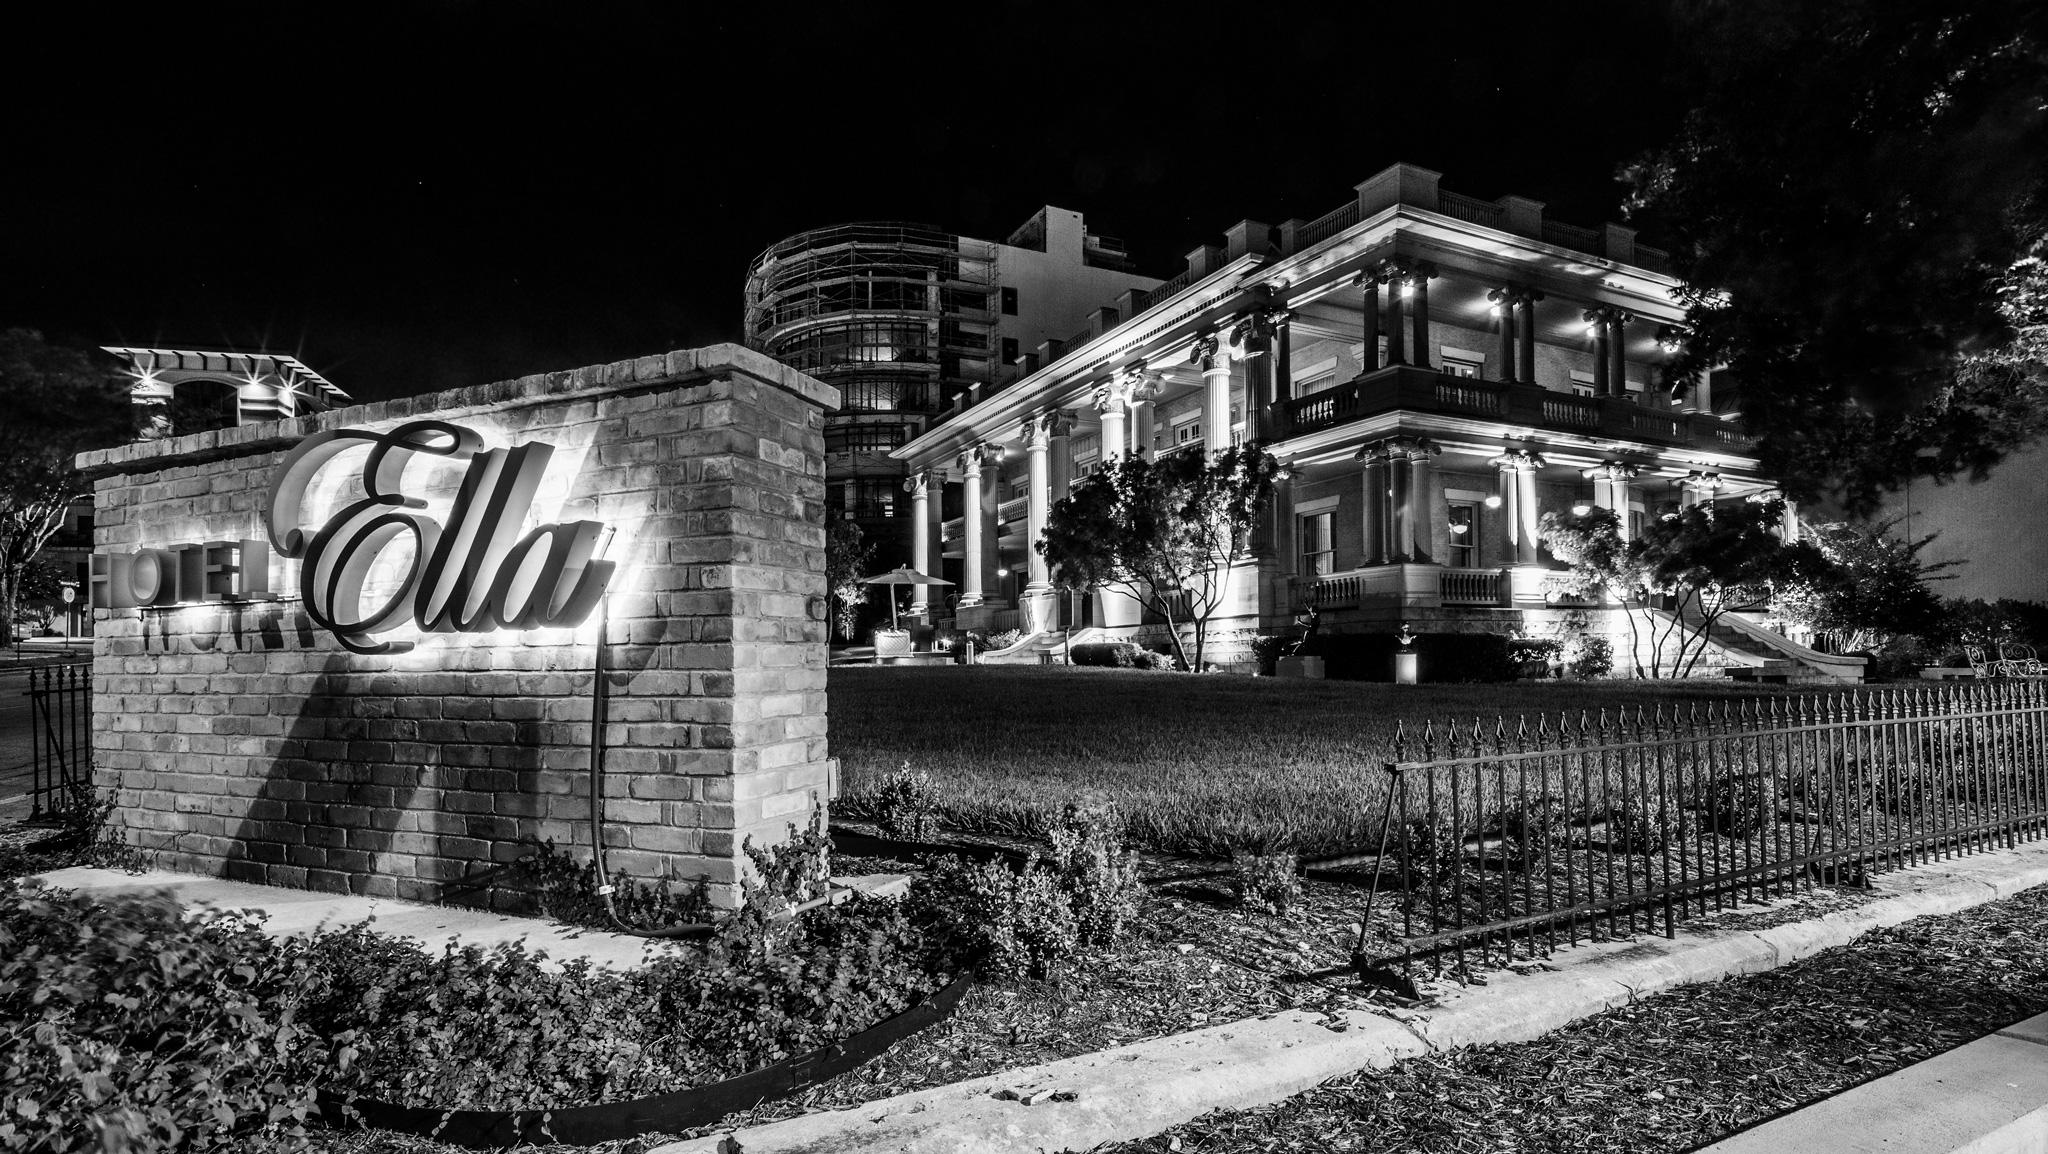 Hotel-Ella.jpg